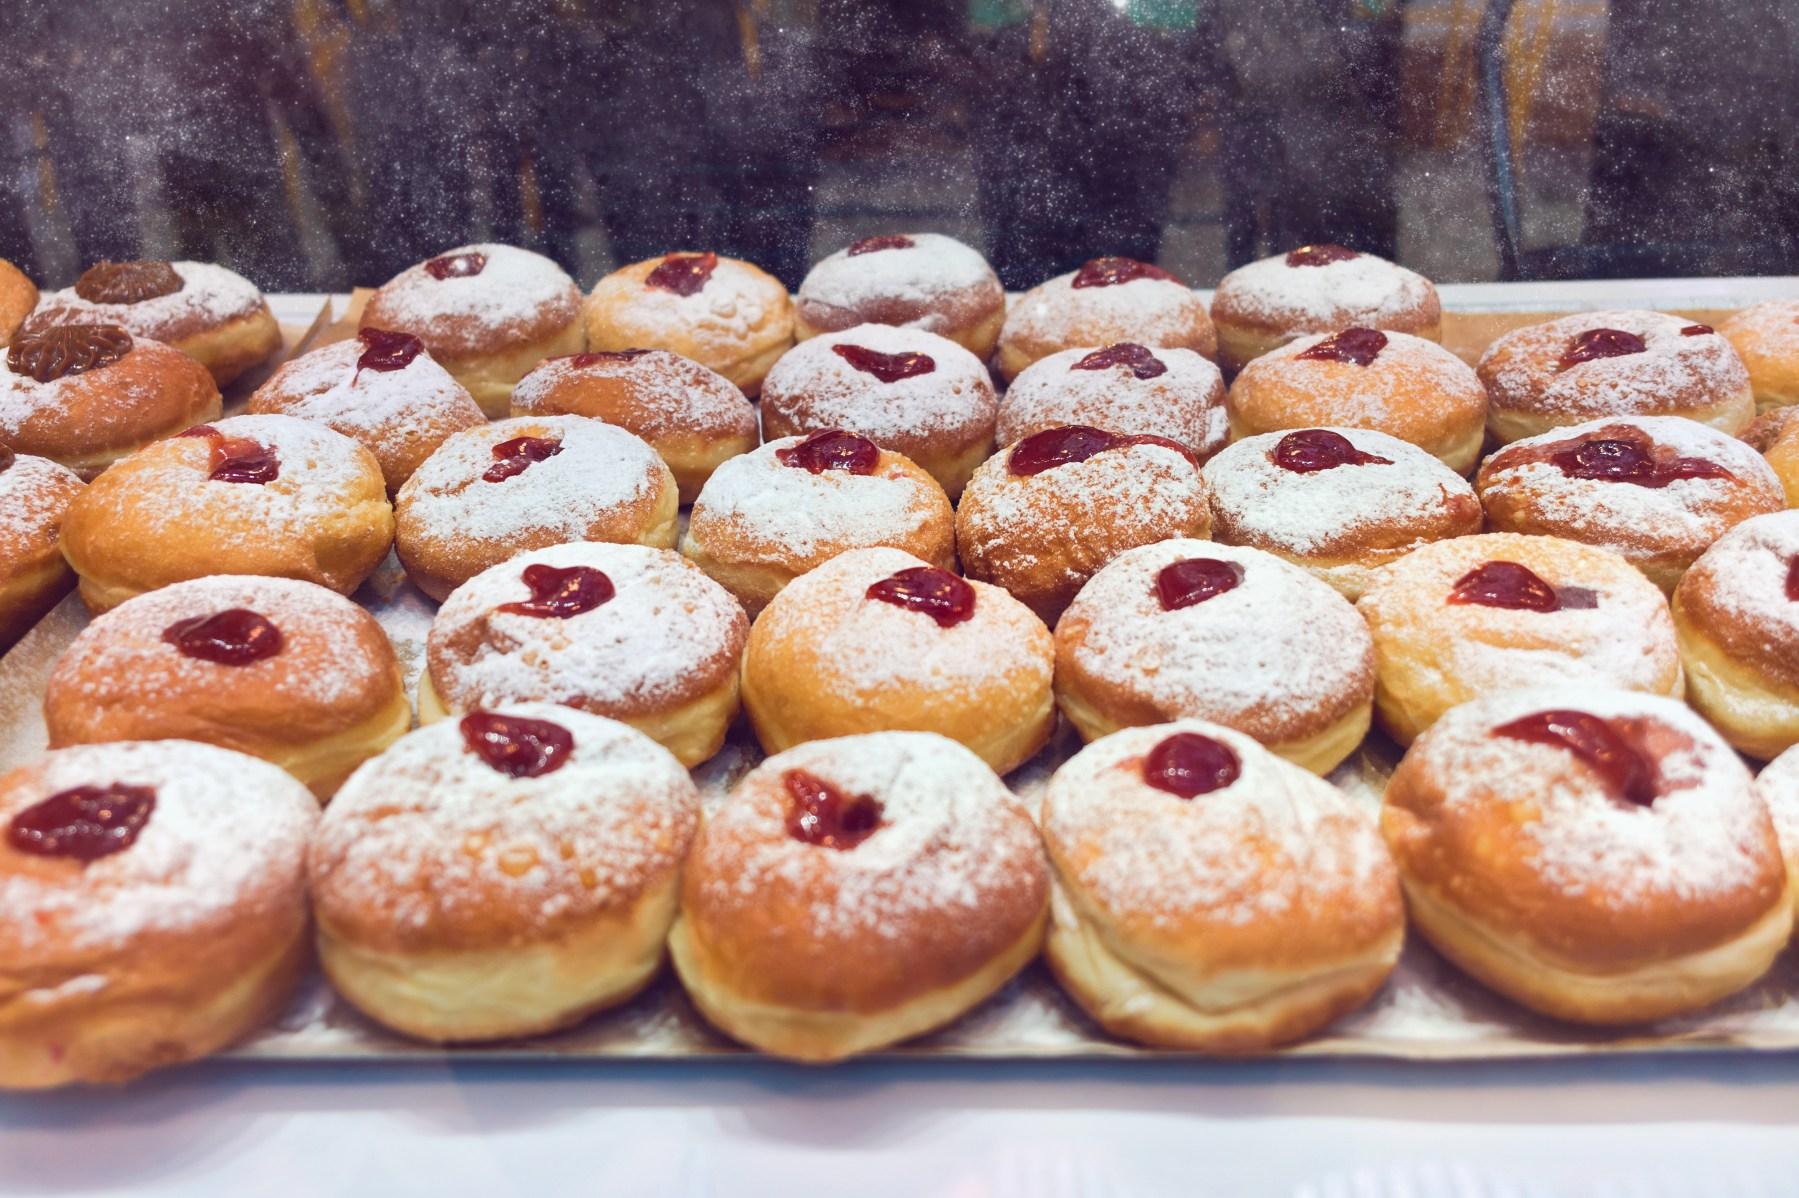 Chanukkah donuts